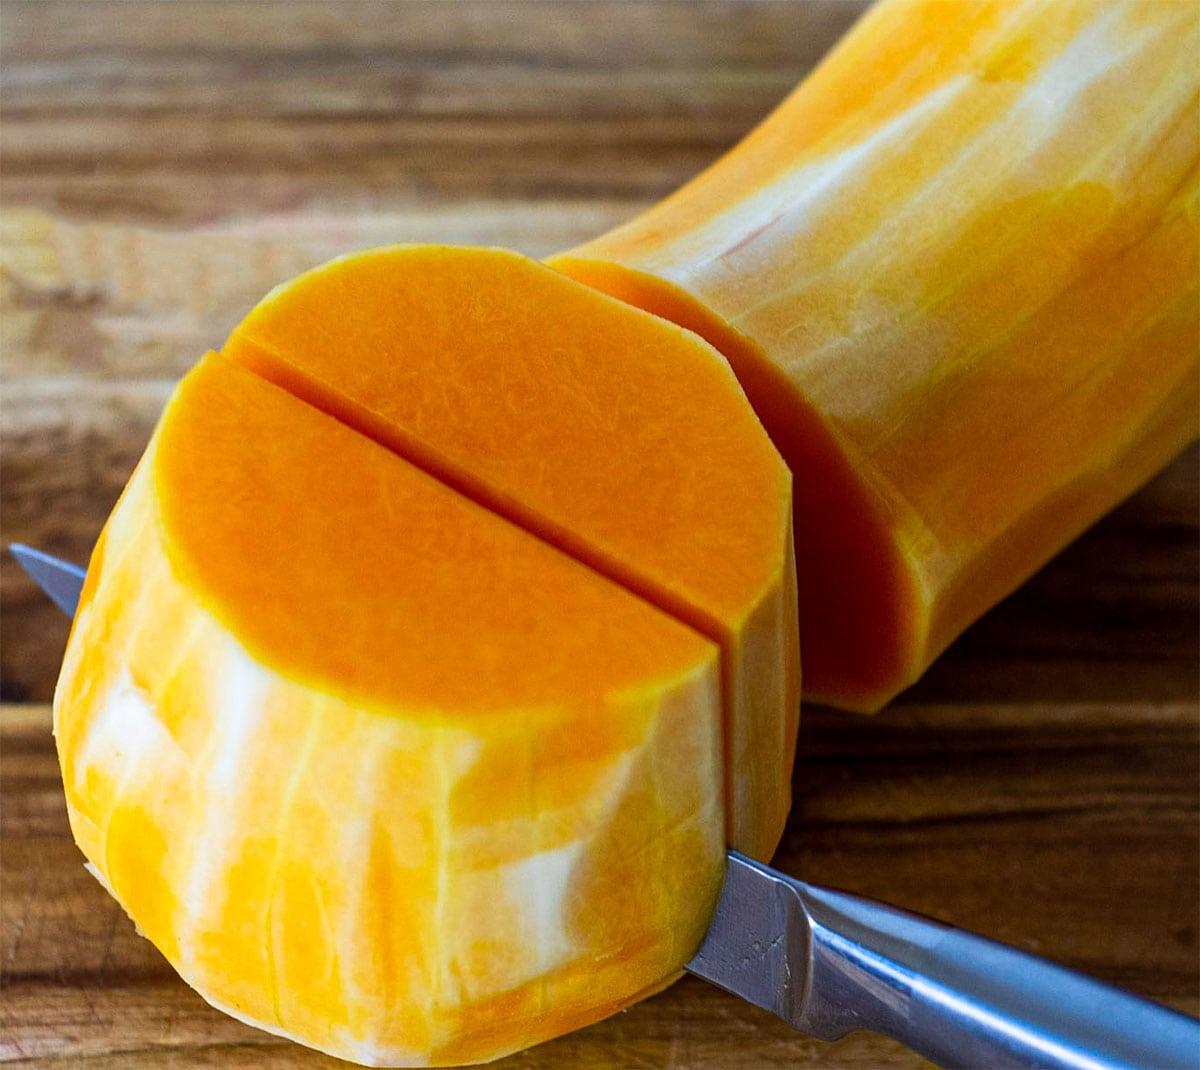 Butternut Squash cut into half